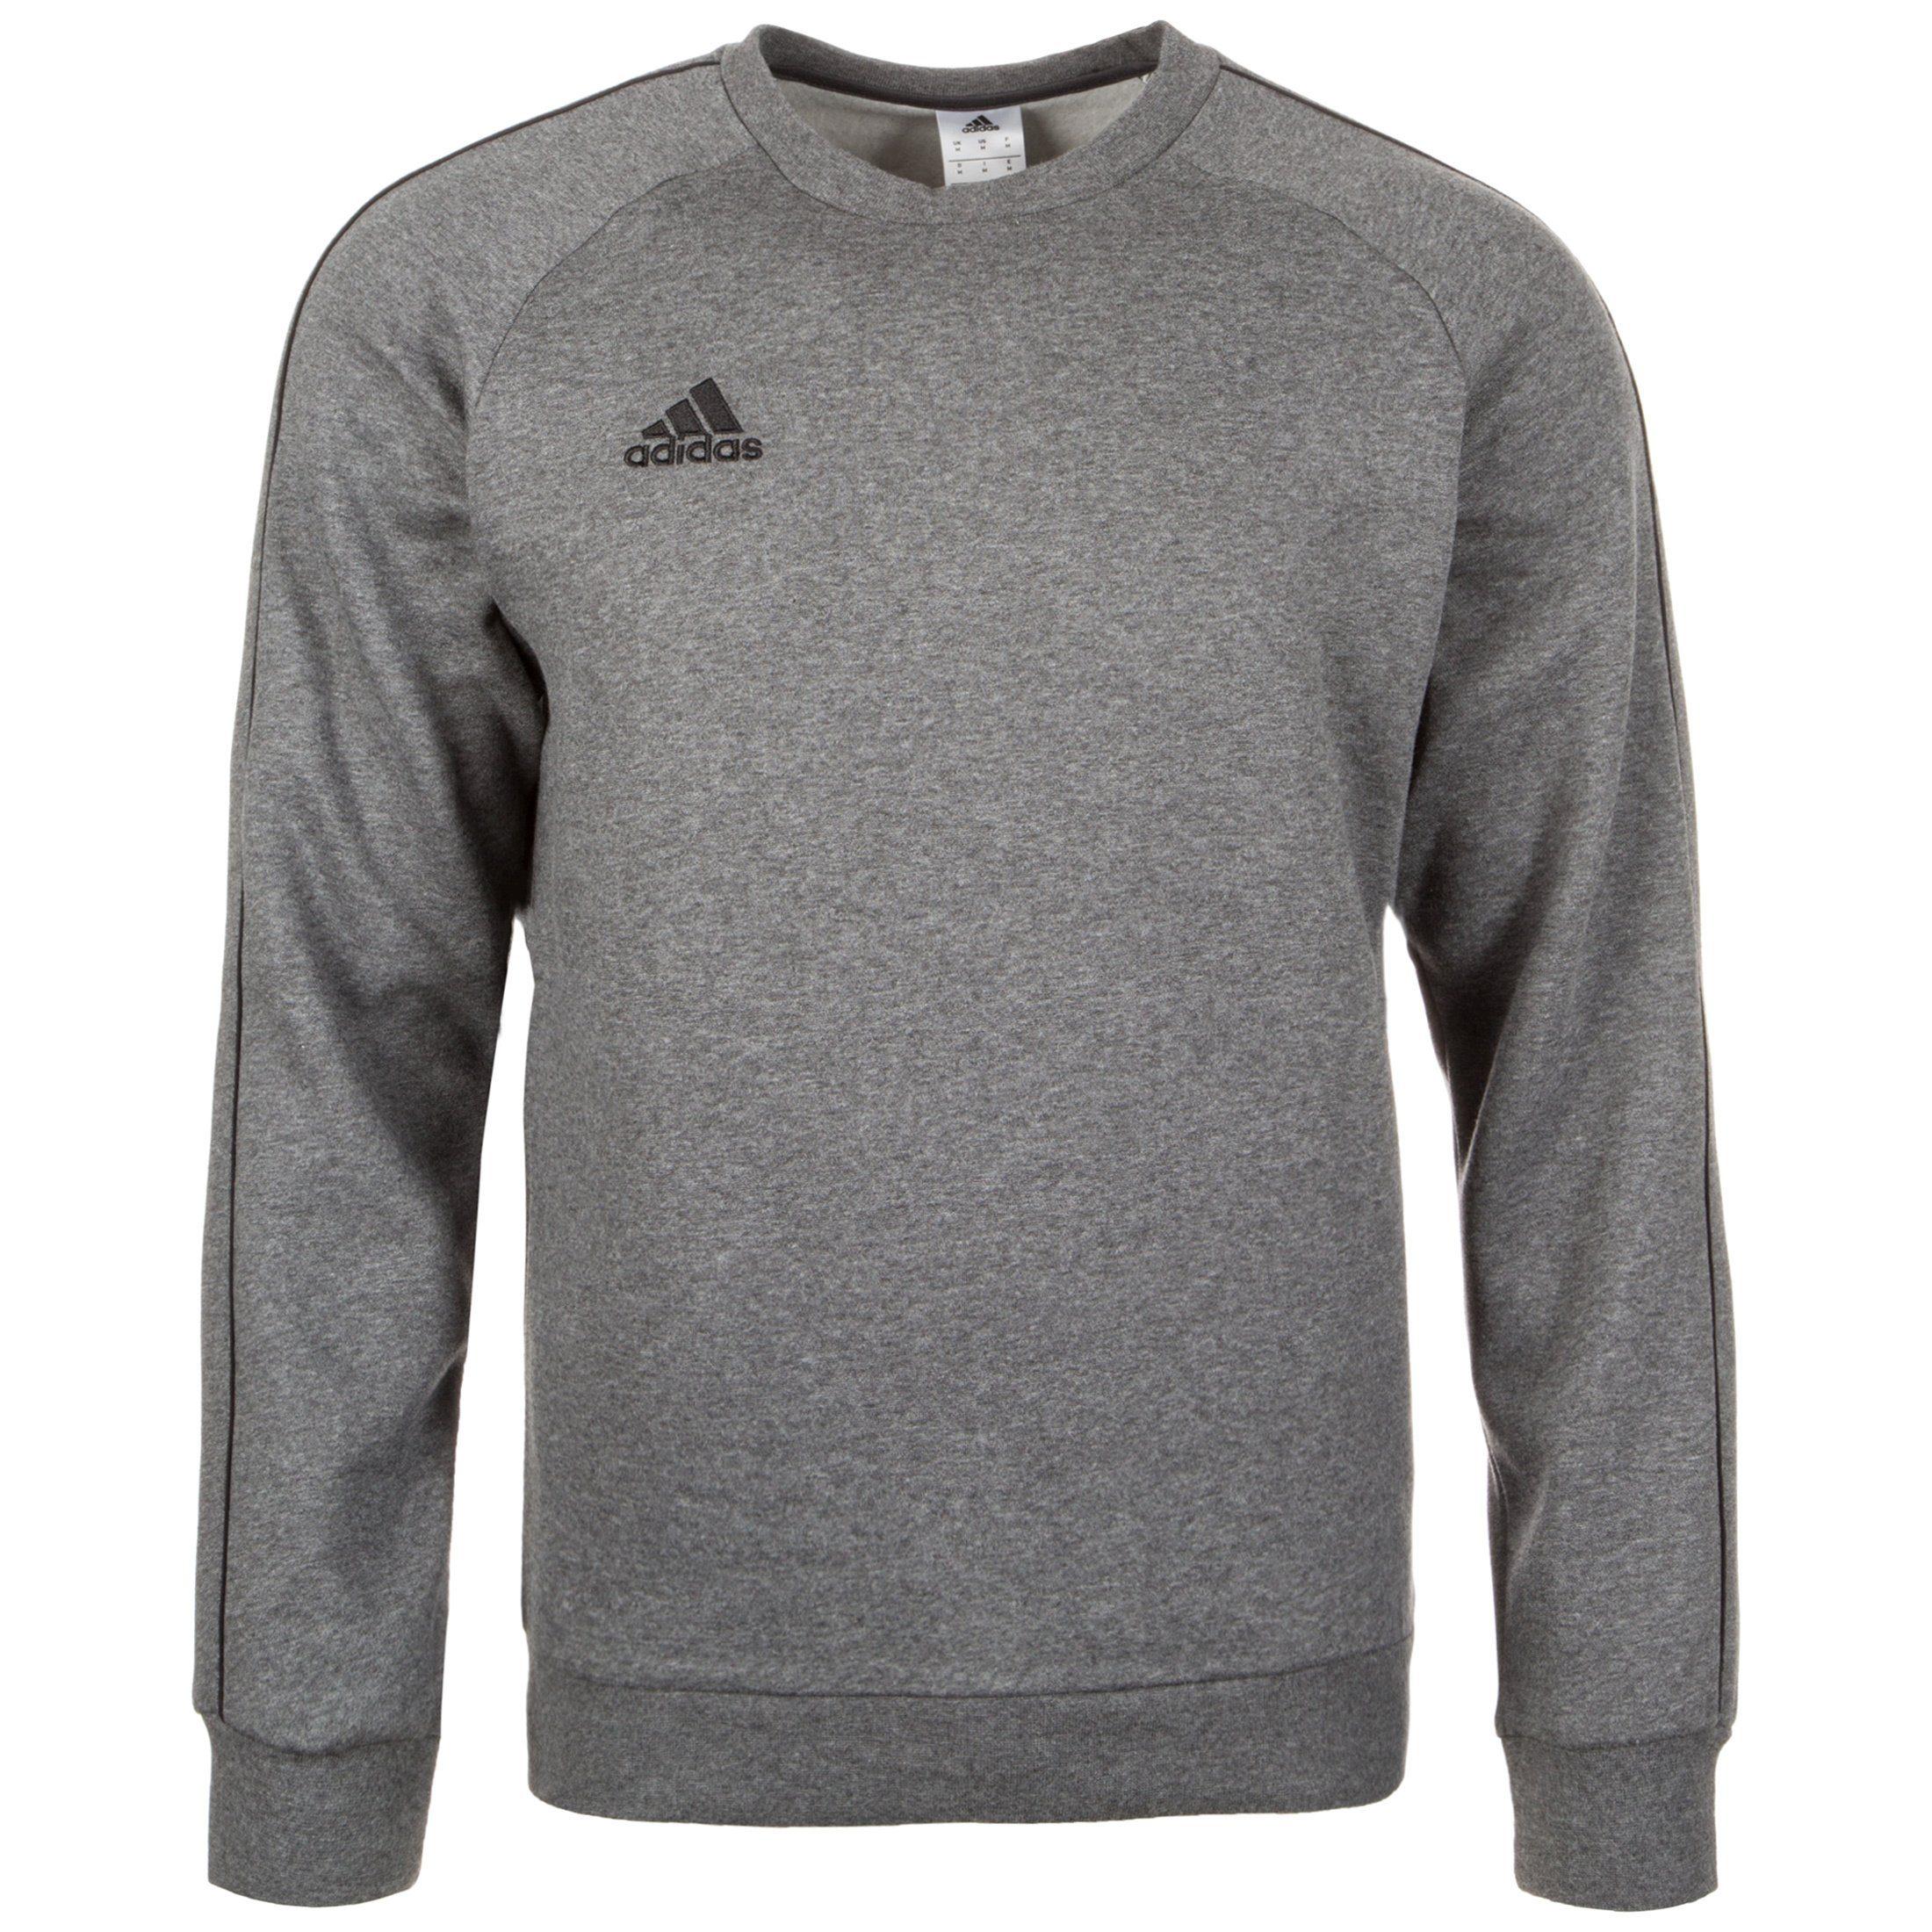 adidas Performance Sweatshirt »Core 18«, Körpernahe Passform online kaufen | OTTO